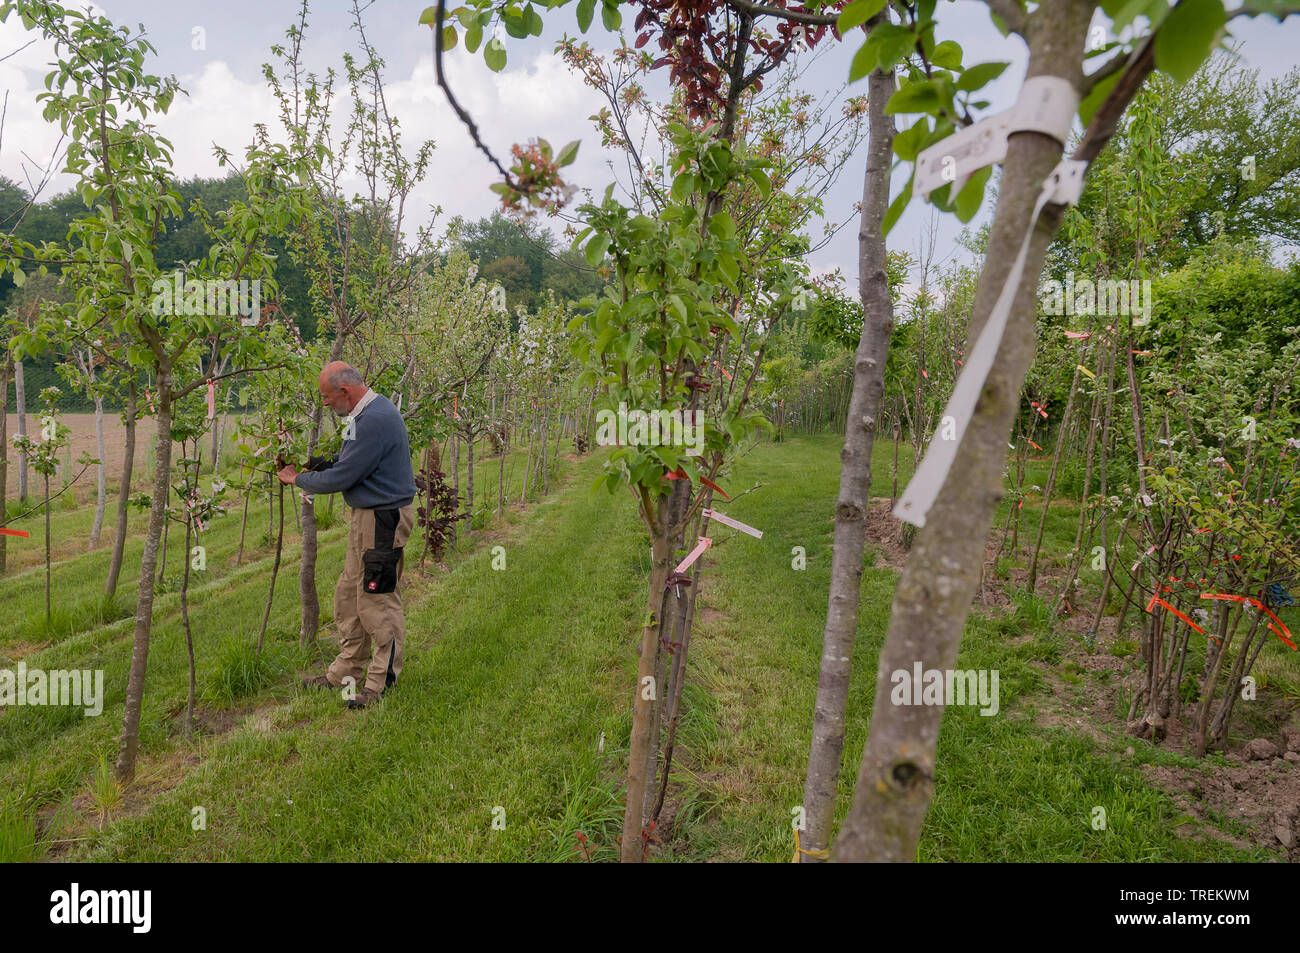 Apfelbaum, Kultur-Apfel, Kulturapfel (Malus domestica), Gaertner kontrolliert Obstbaeume in einer Baumschule, Deutschland | apple tree (Malus domestic - Stock Image